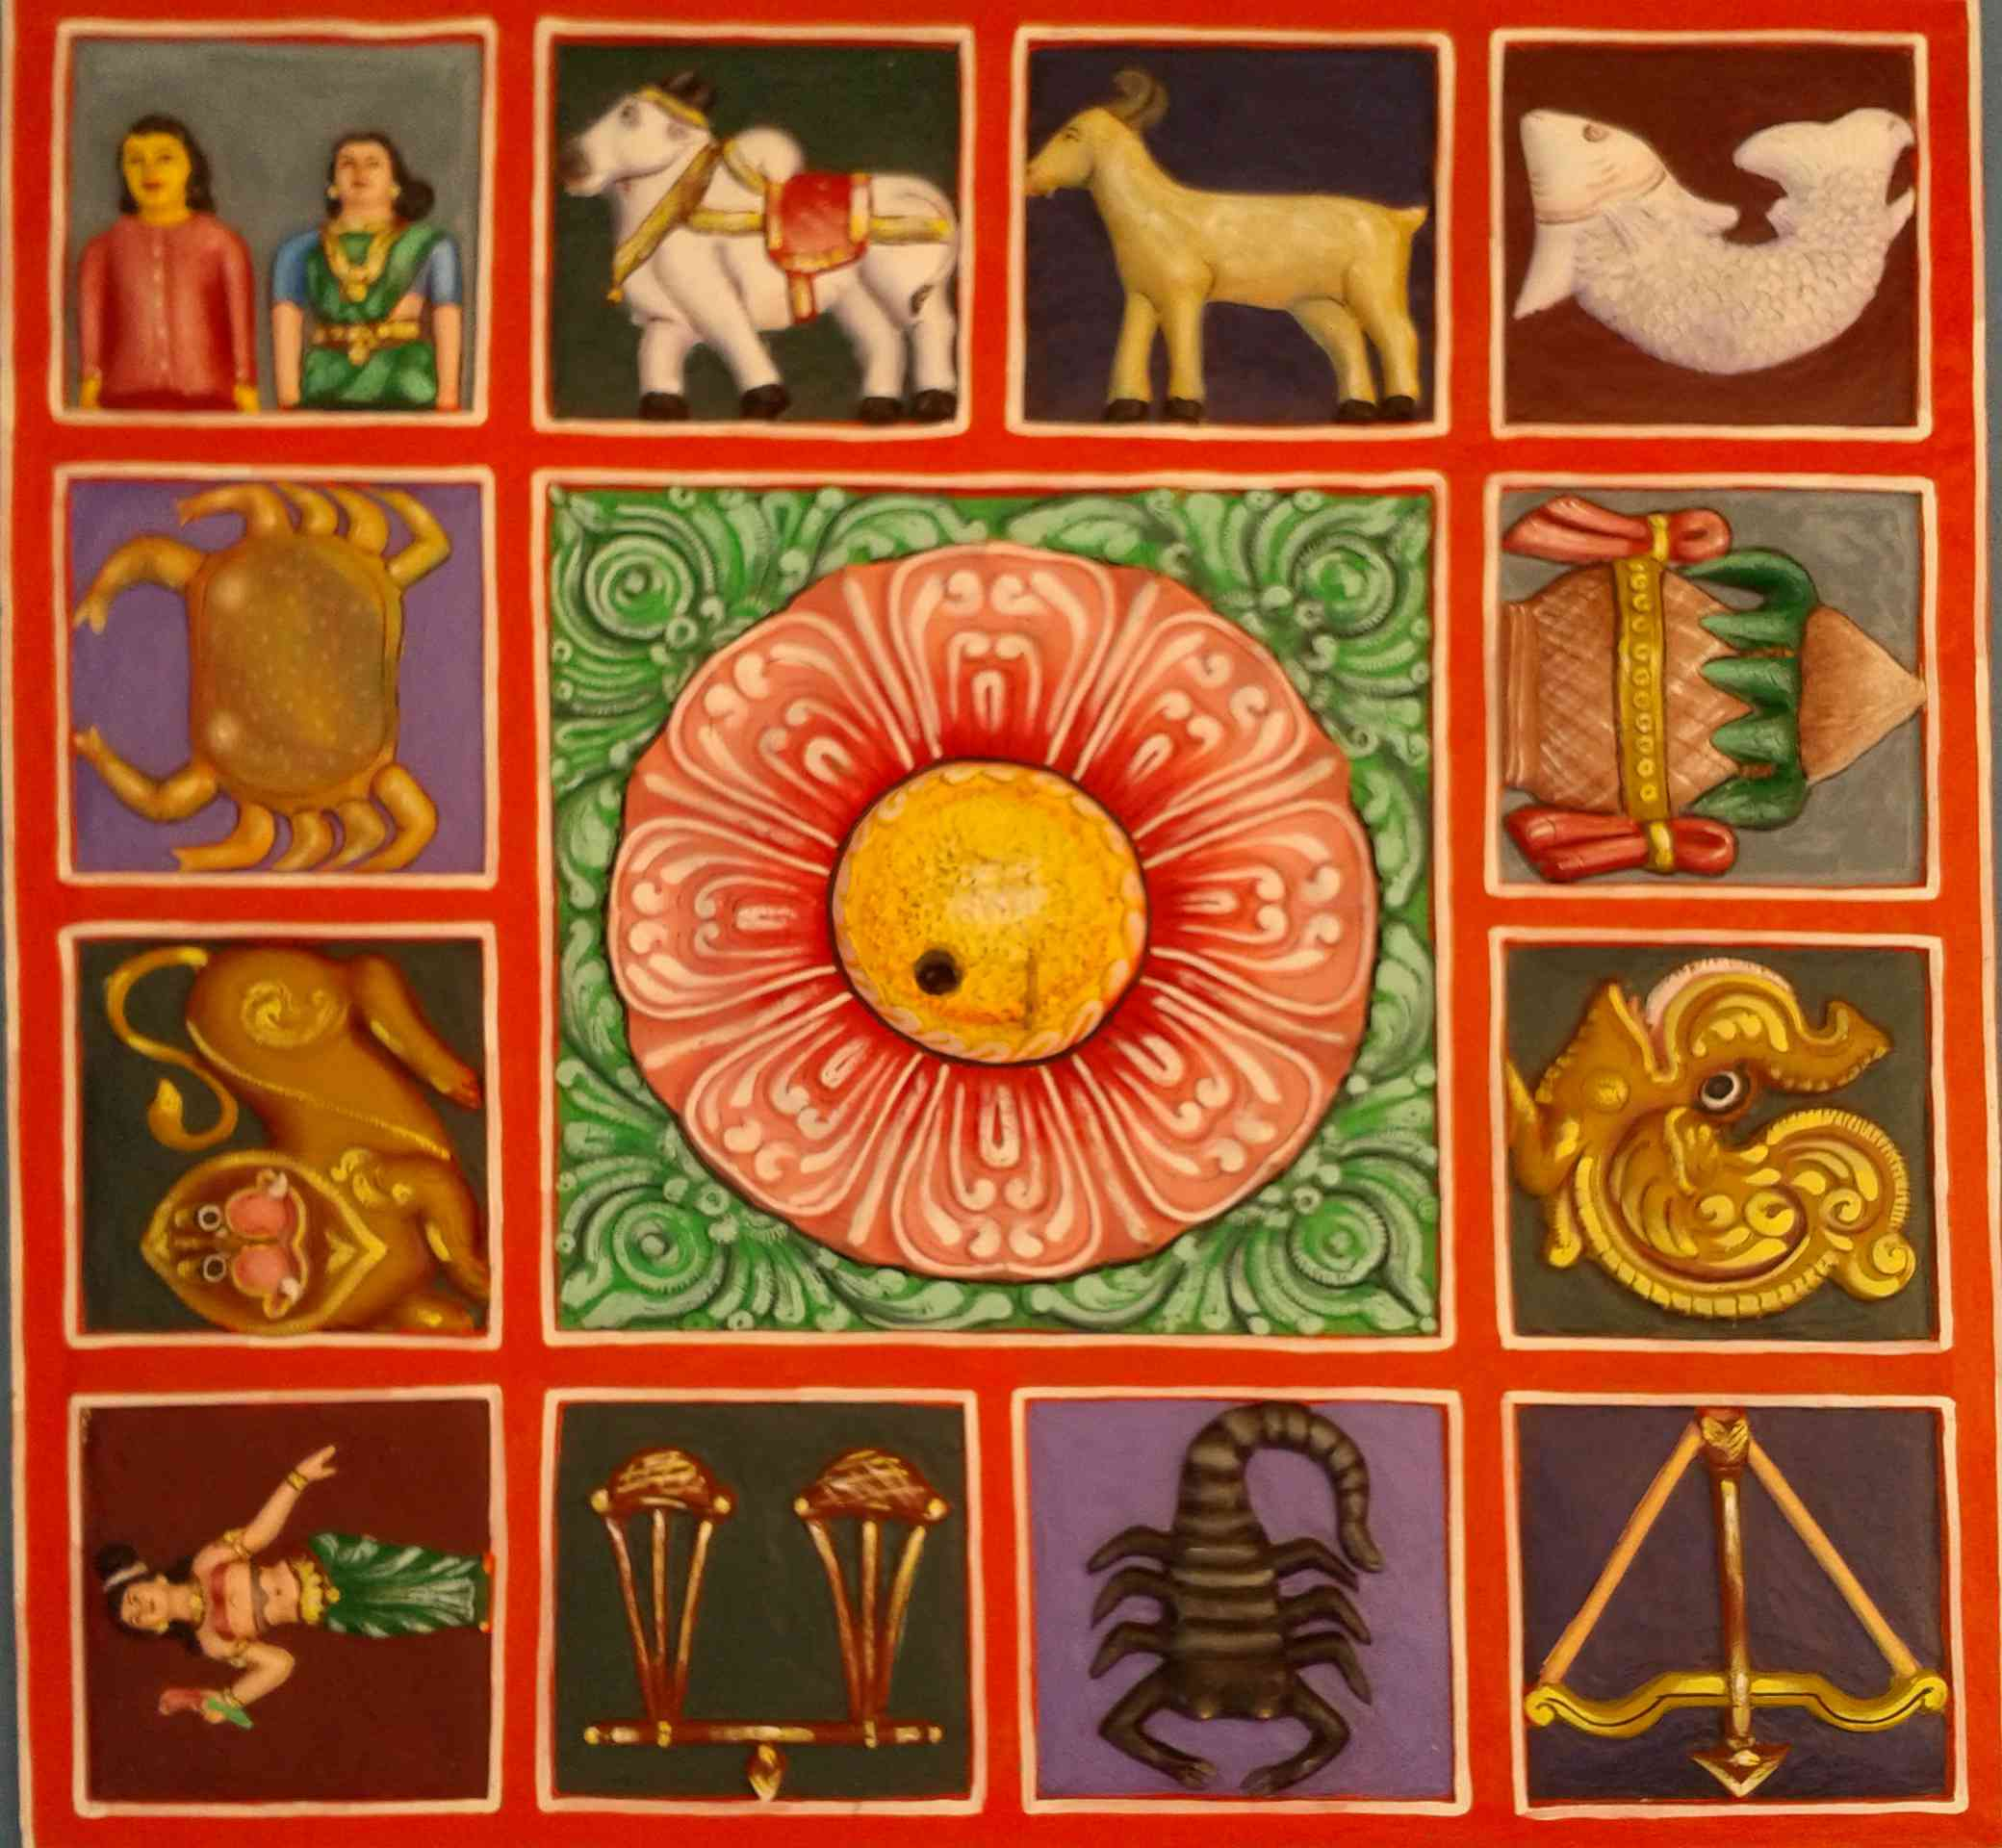 Zodiac symbols on the terrace of a gopuram in Kanipakam, Andhra Pradesh.